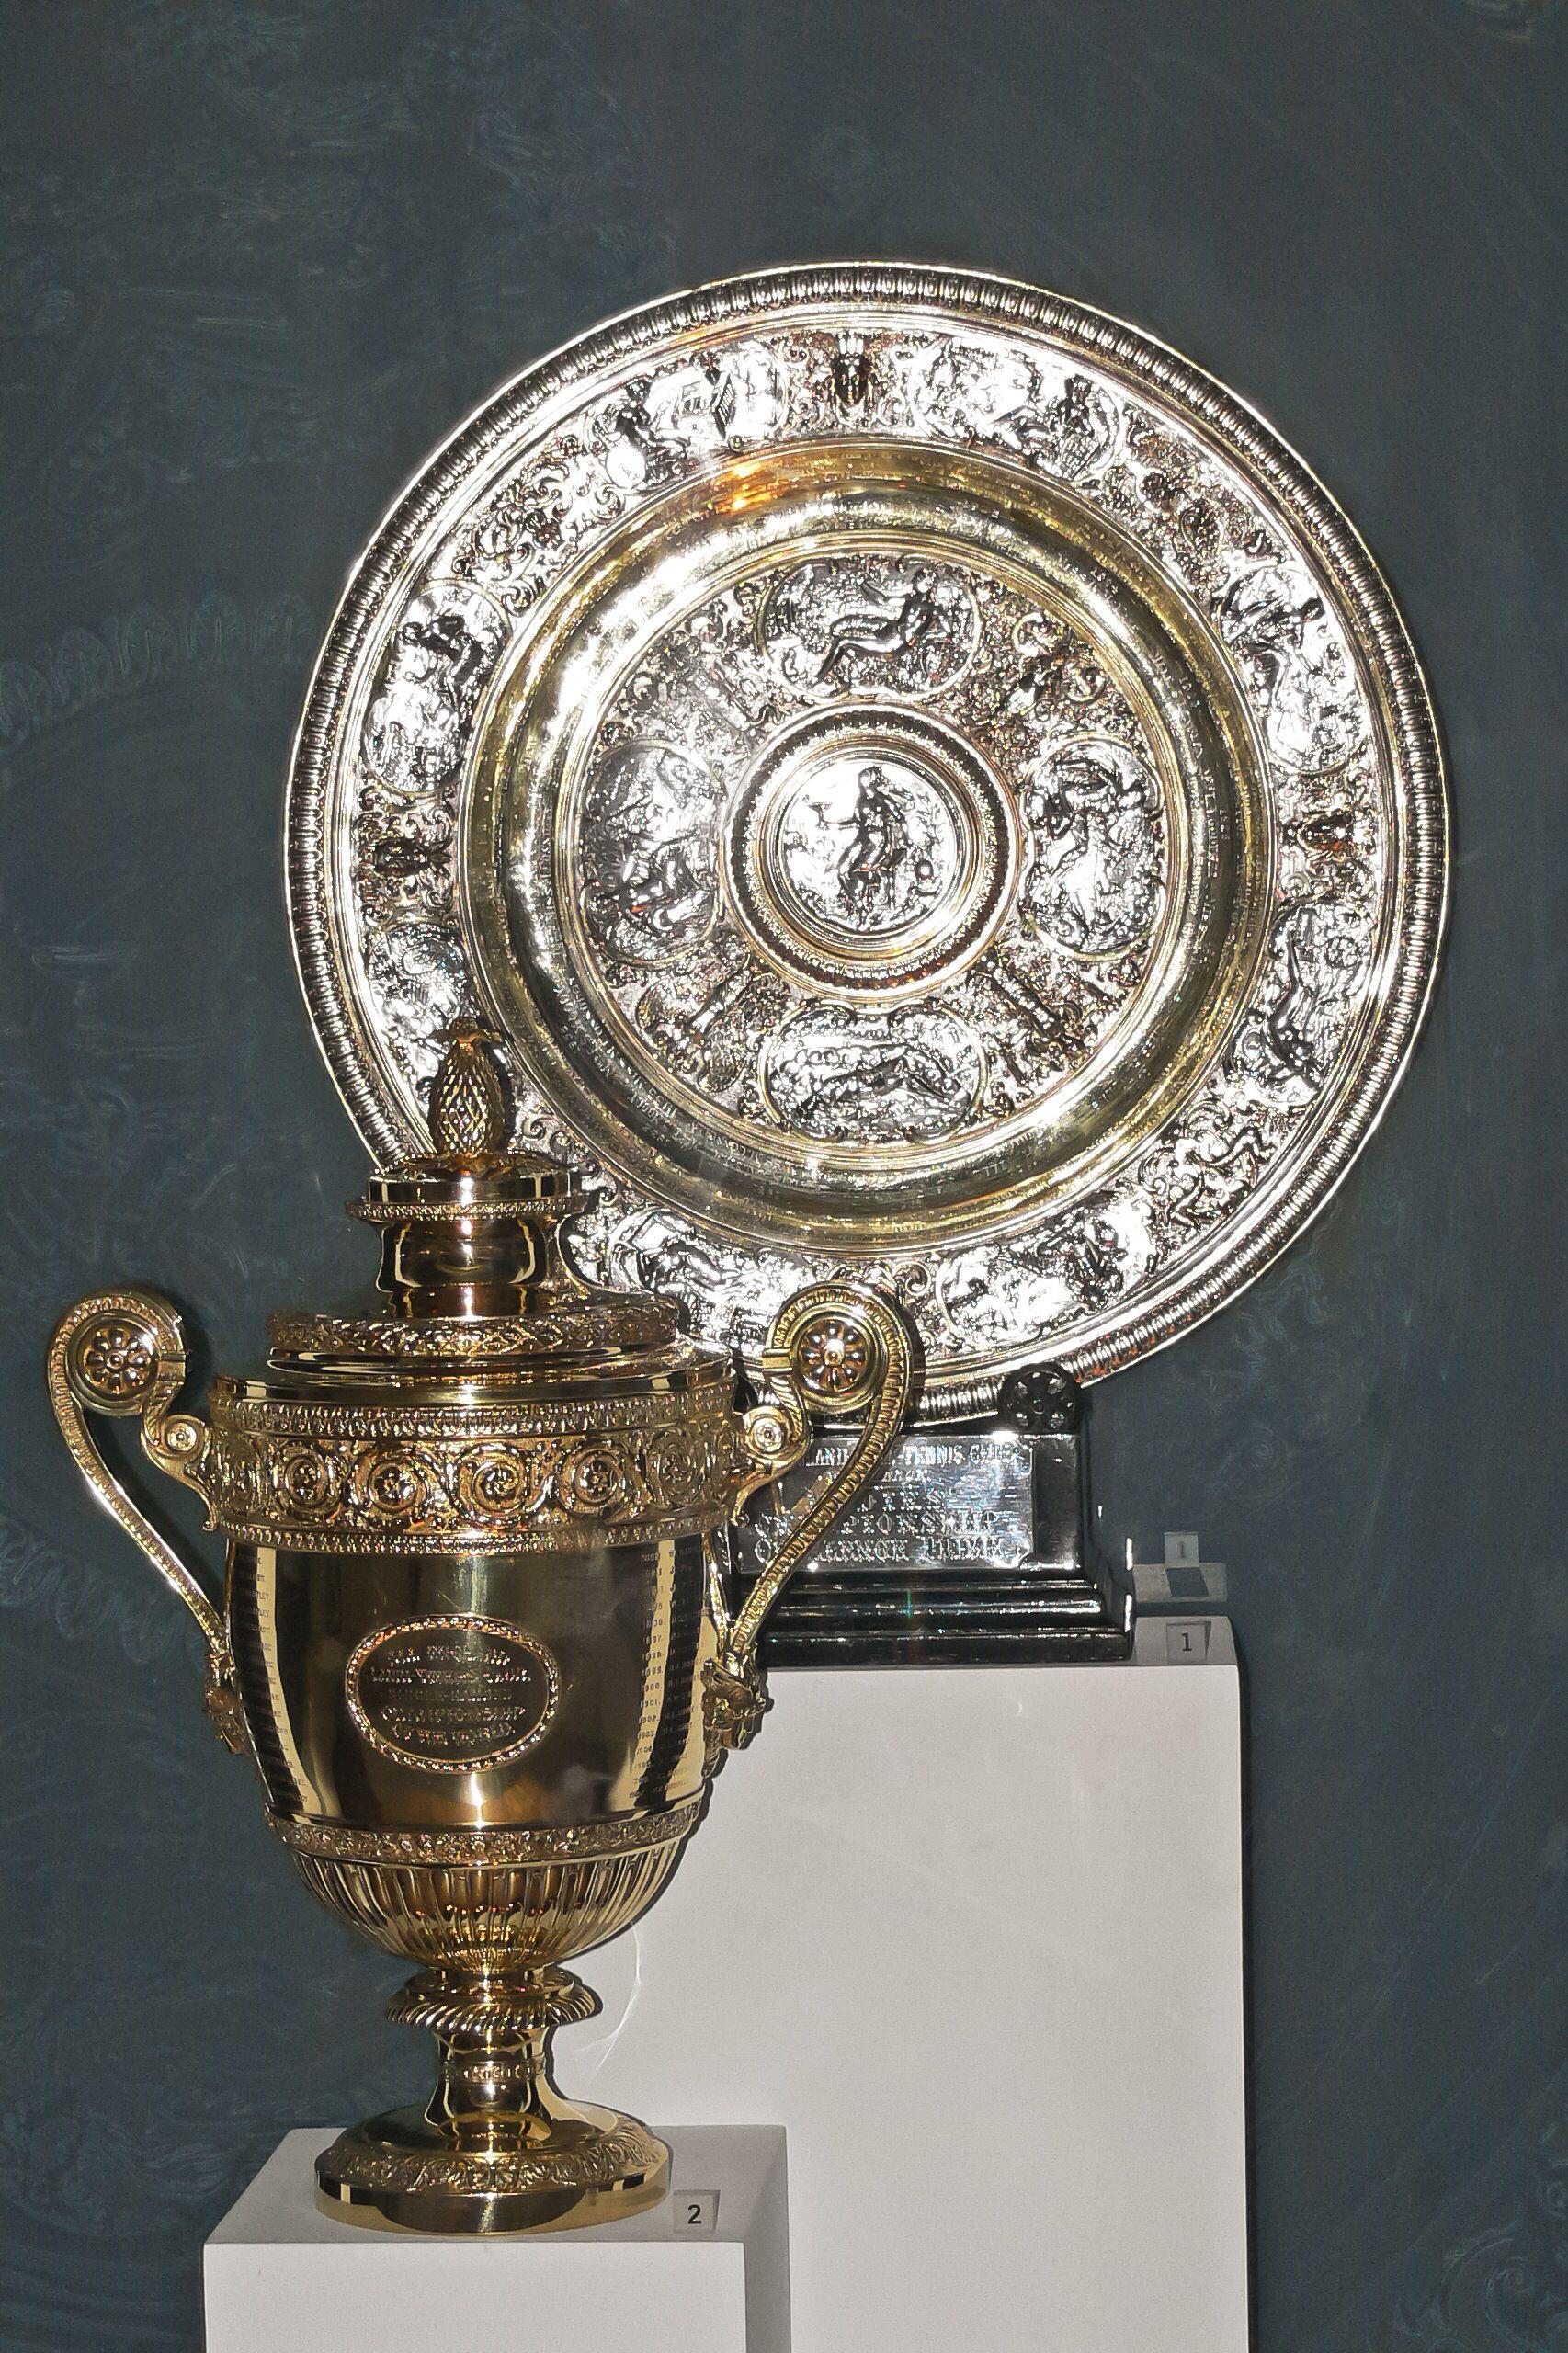 Tickets For Wimbledon Final Preferably The Men S Match Wimbledon Coppie